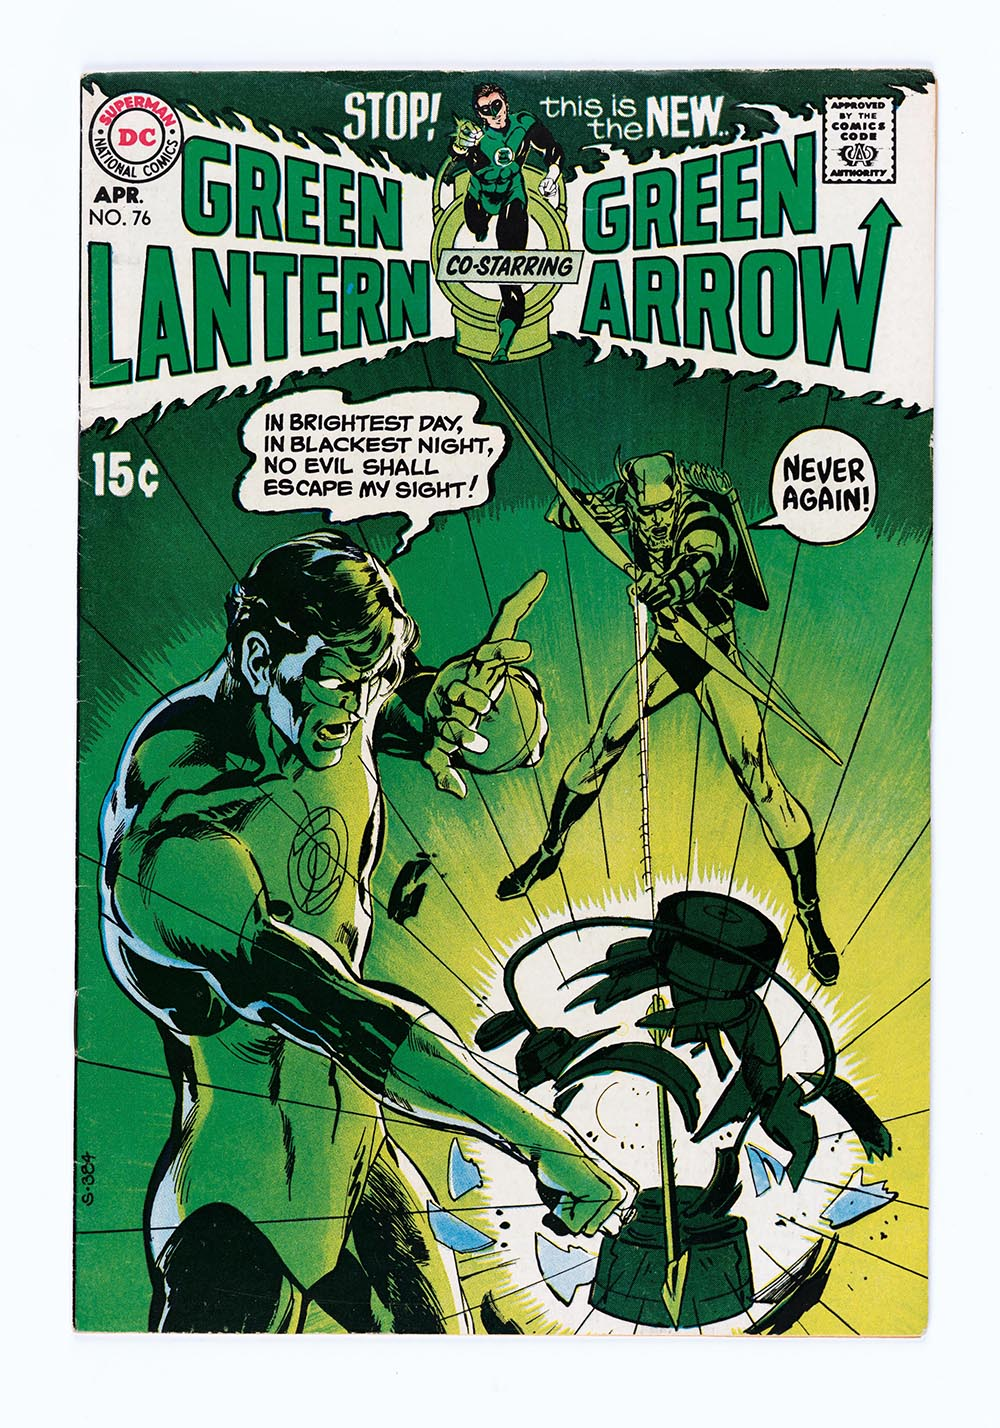 Green Lantern No. 76 cover art by Neal Adams, April 1970